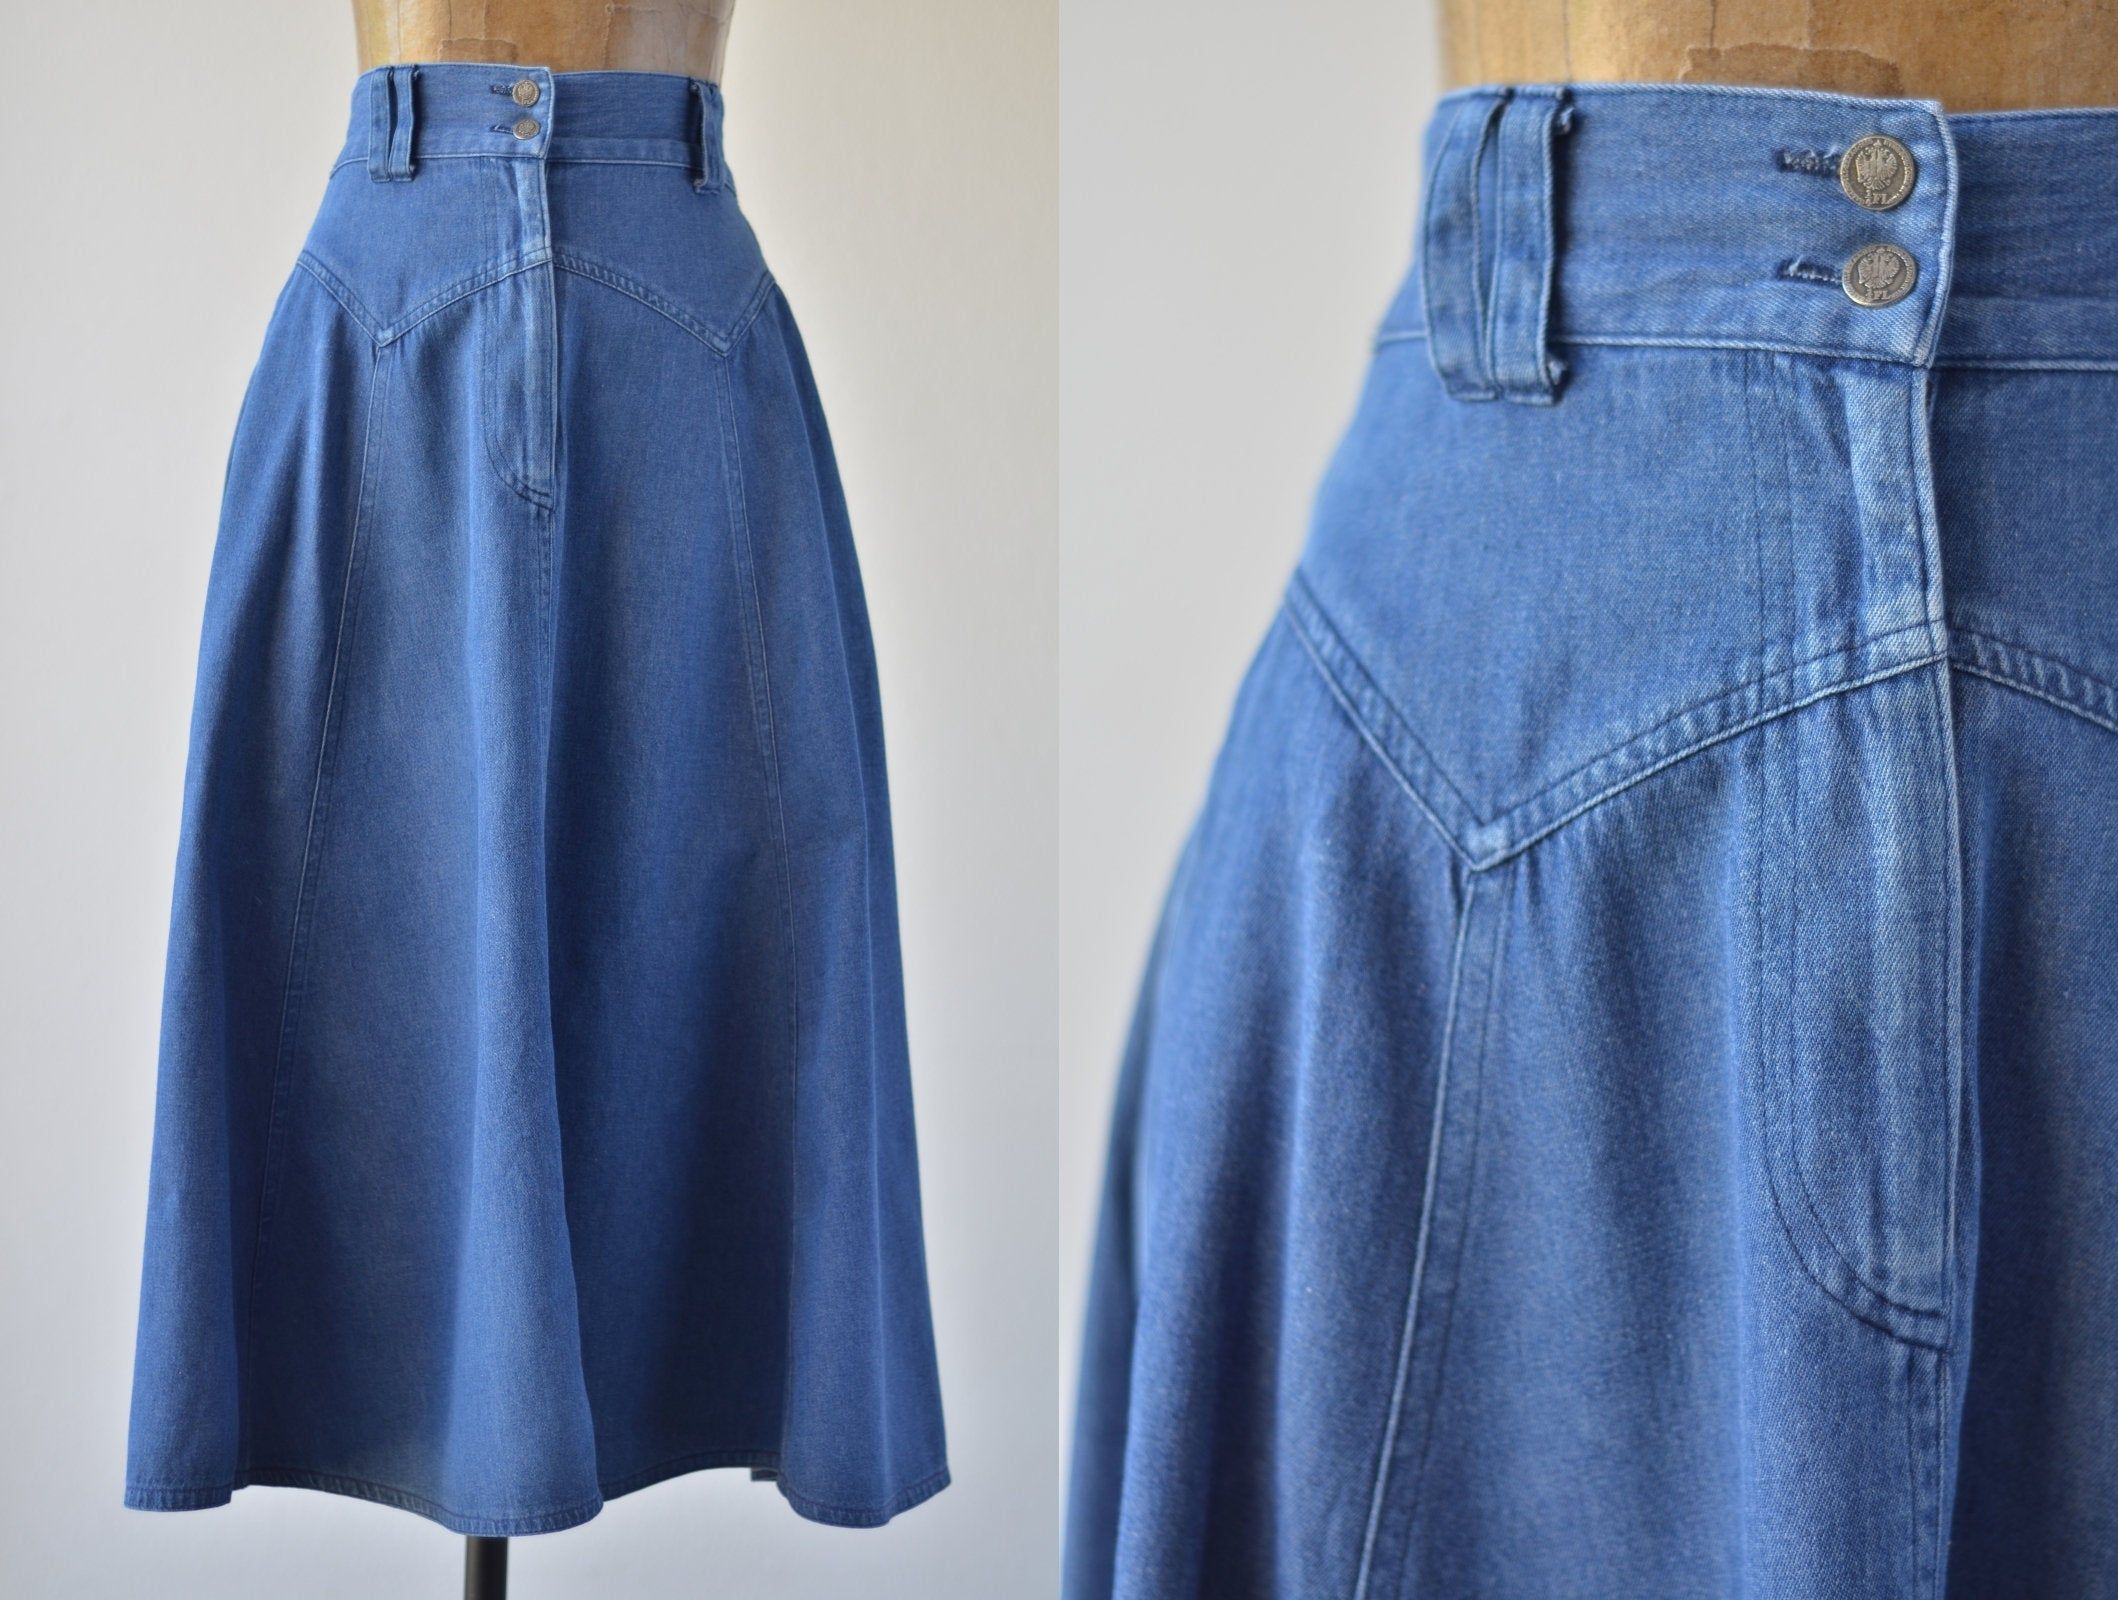 DENIM PENCIL SKIRT Vintage Medium Blue Jean High Waist Midi Cotton Woman 90/'s  27 Waist  36 Hips  Size 5